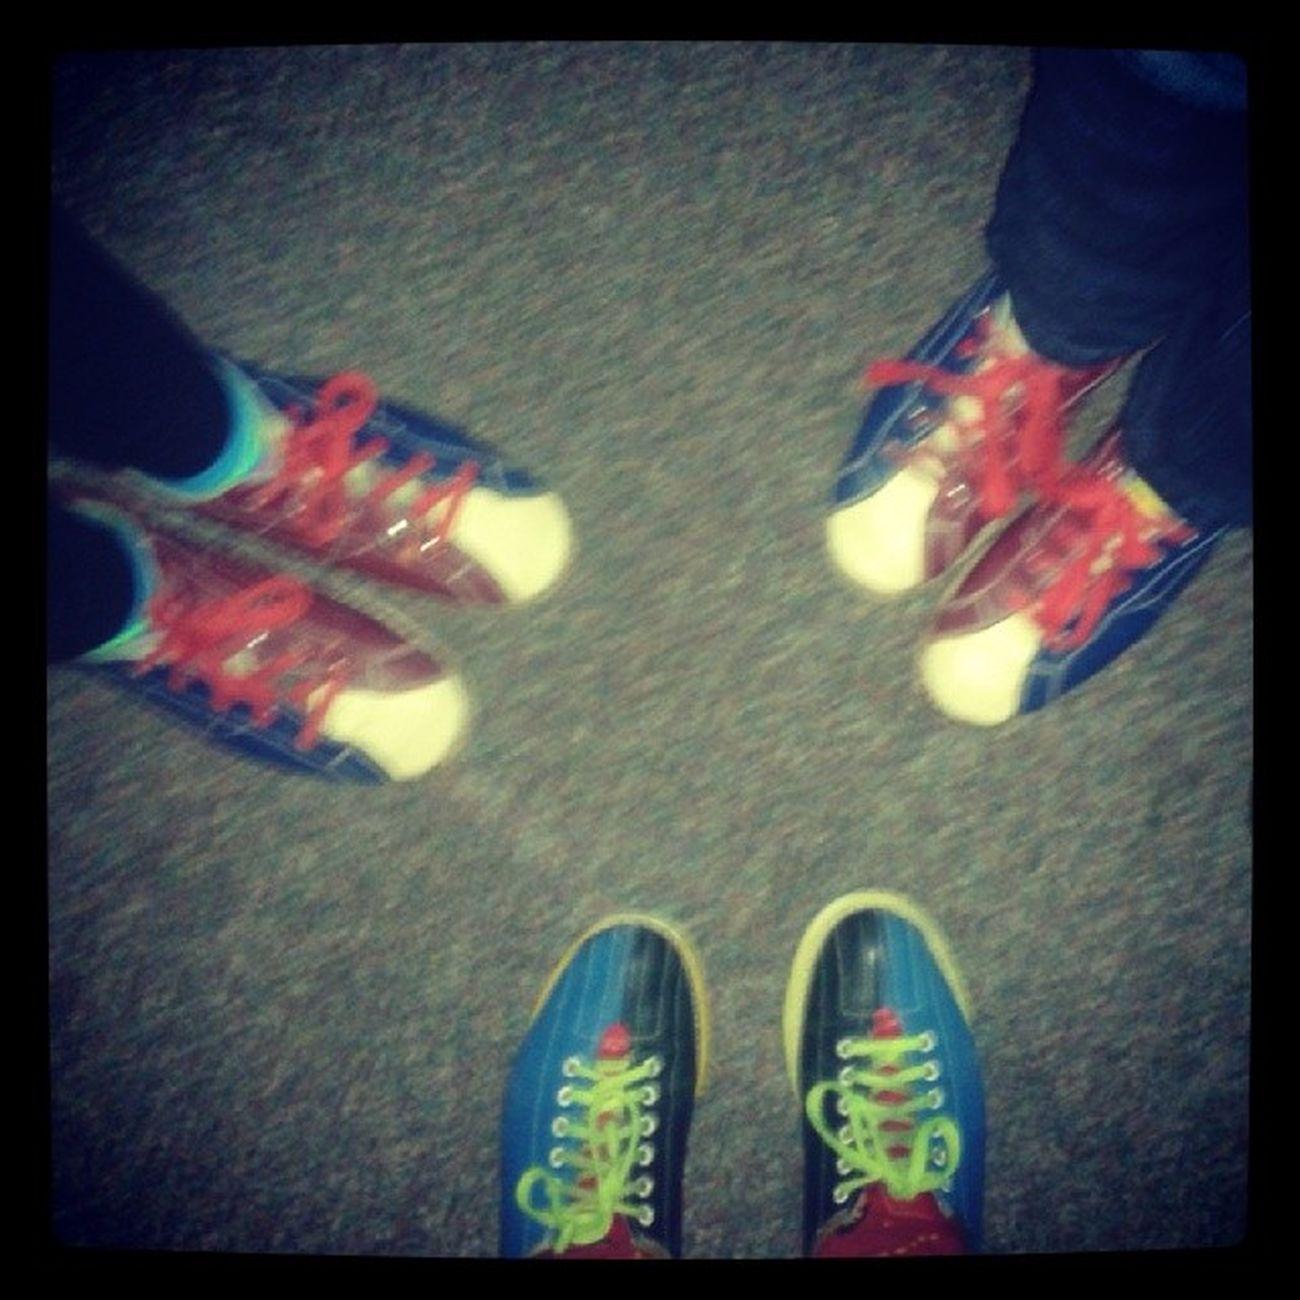 Bowling with the family! Fun Bowling Yah WOW shoesglowblowinggoodtimeslikelikeitup